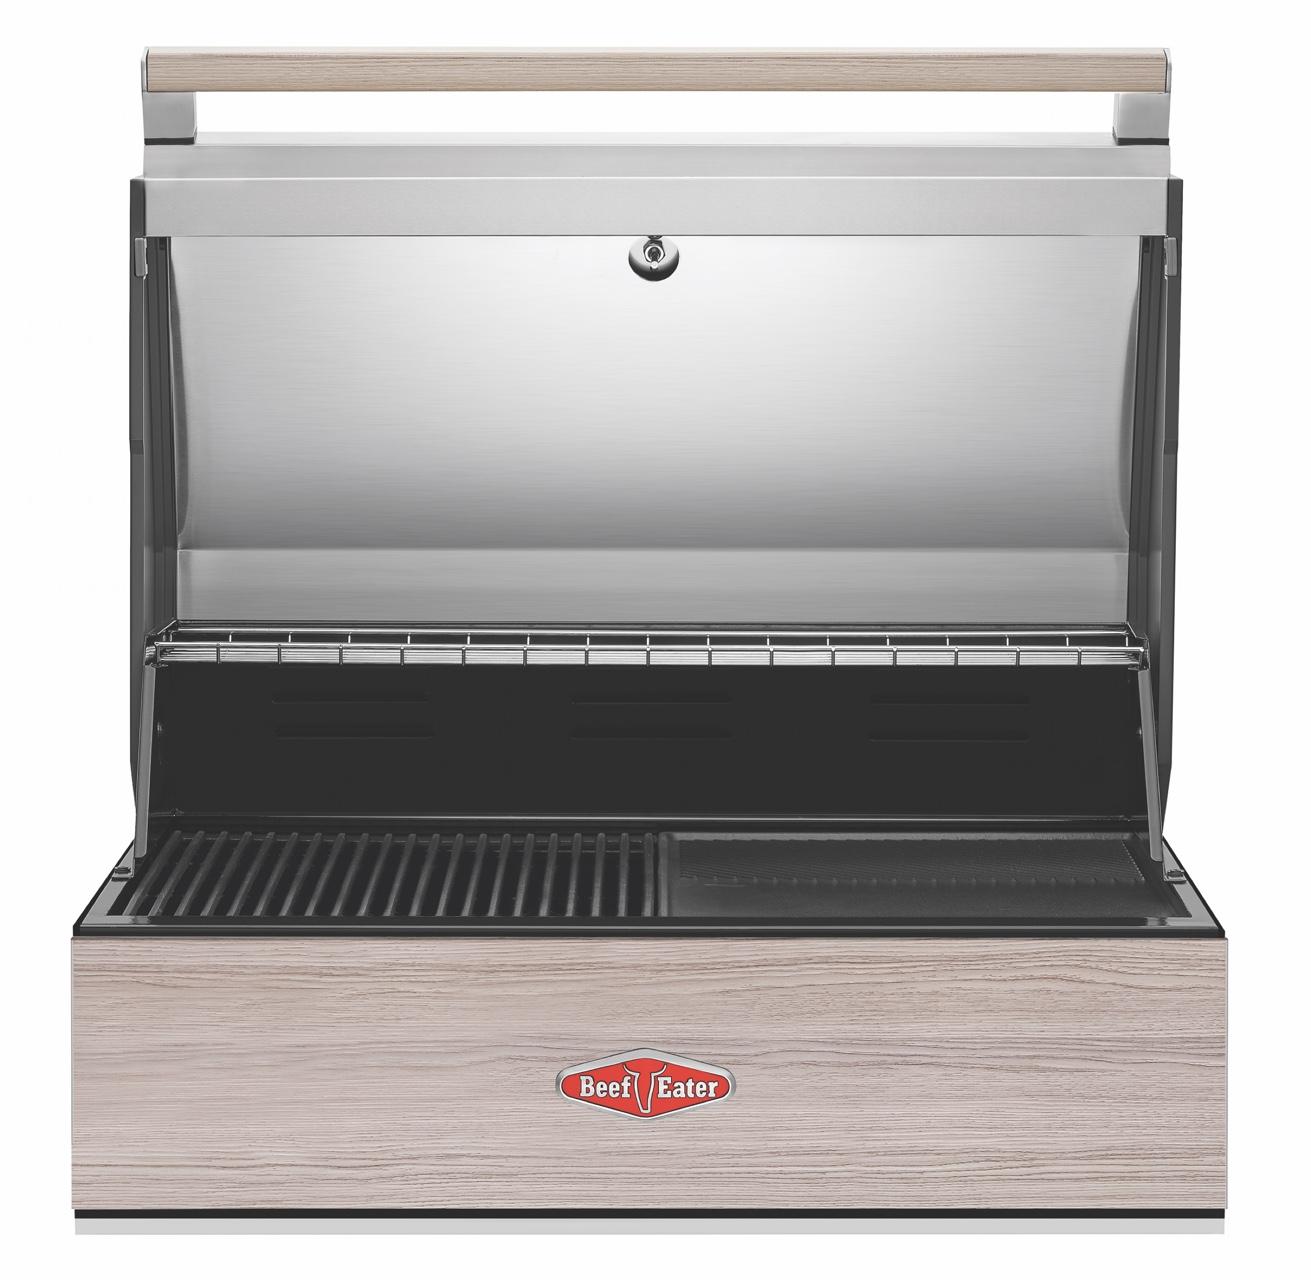 Beefeater Gasgrill 1500 Serie - 4 Brenner Einbaugrill